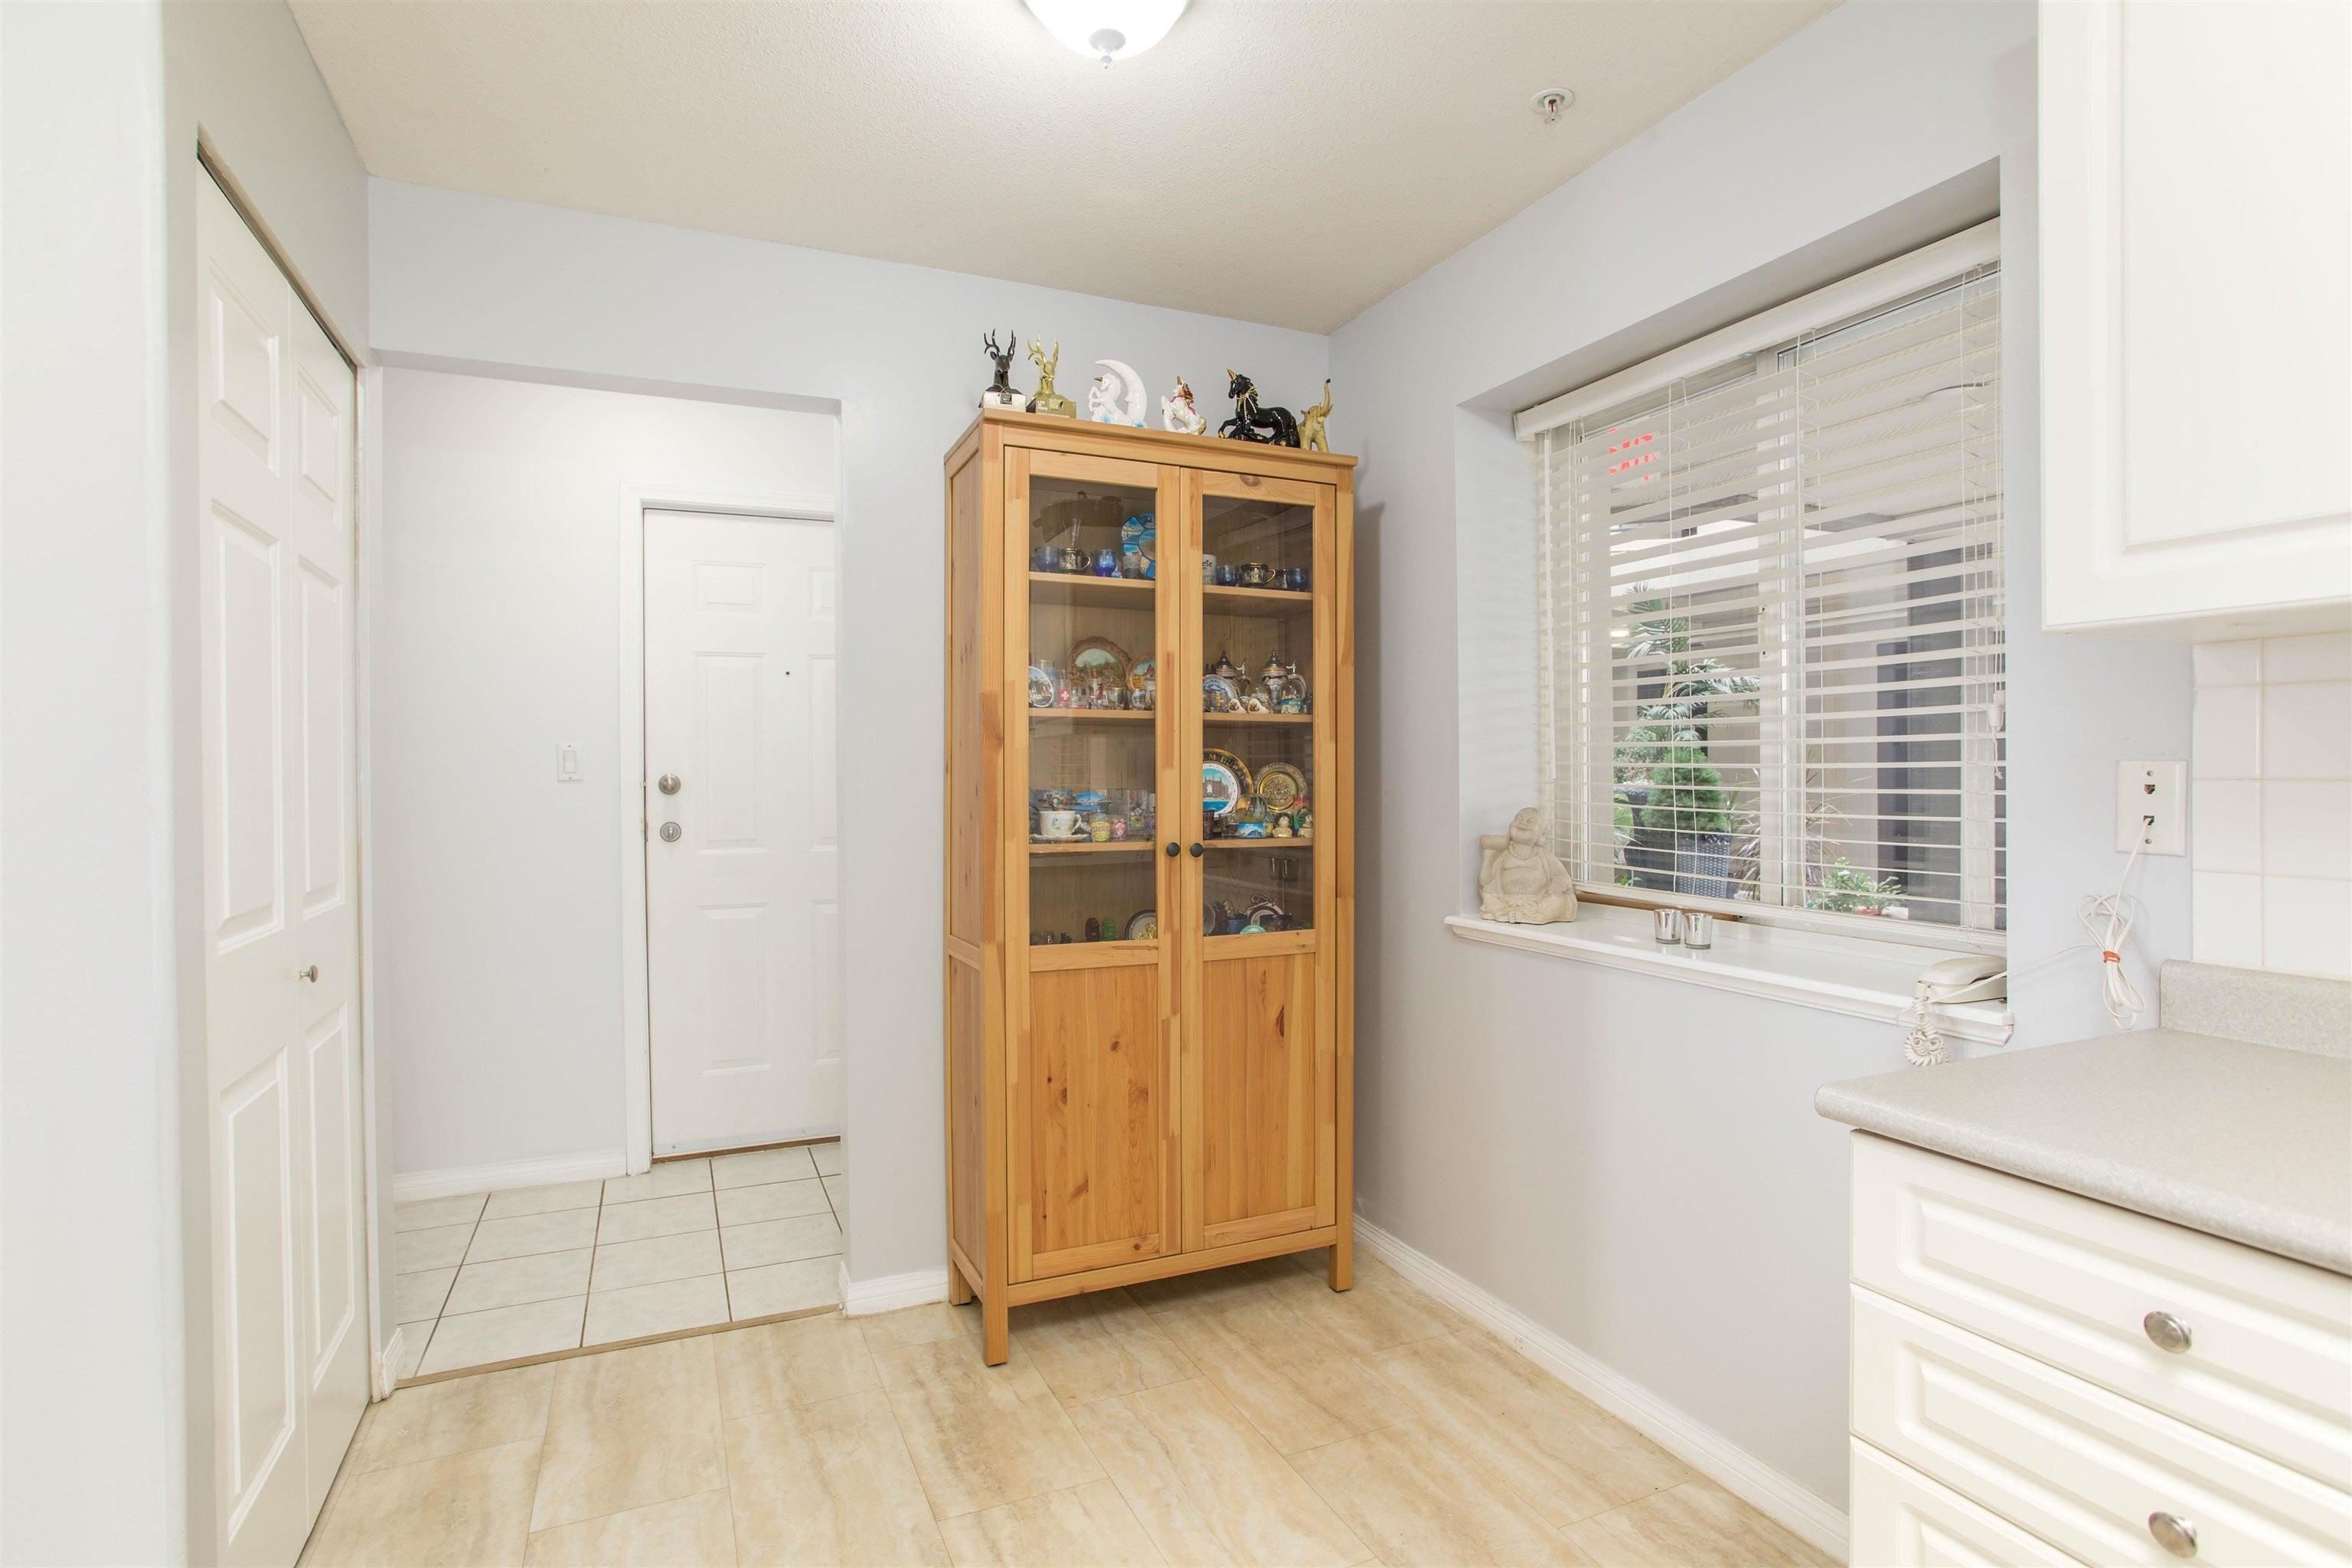 7 205 LEBLEU STREET - Maillardville Apartment/Condo for sale, 3 Bedrooms (R2625671) - #10